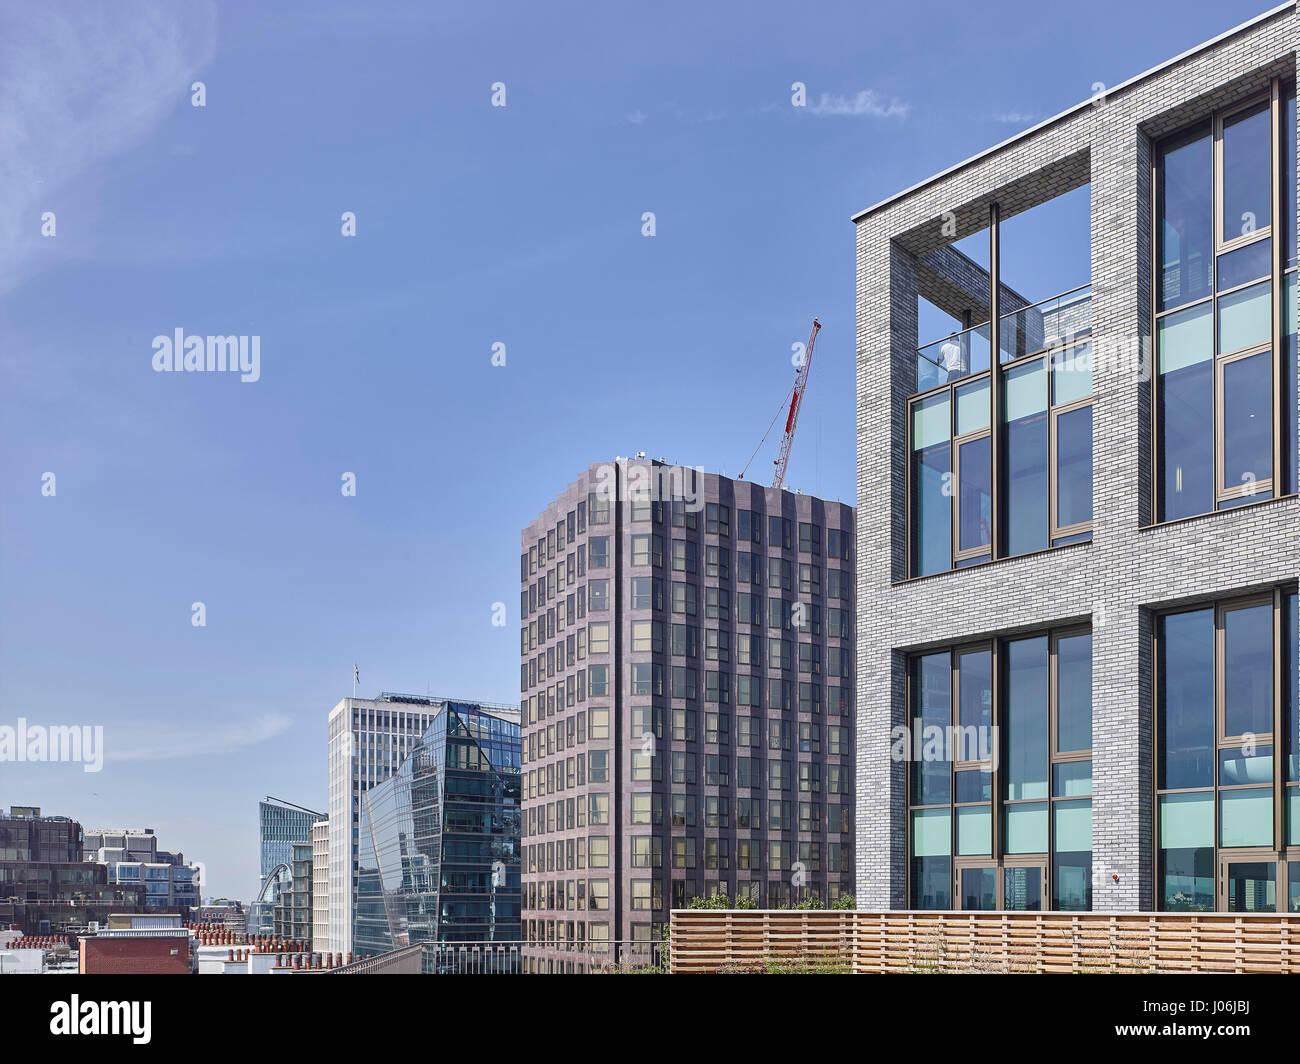 Cityscape. 55 Victoria Street, London, United Kingdom. Architect: Stiff + Trevillion Architects, 2016. - Stock Image